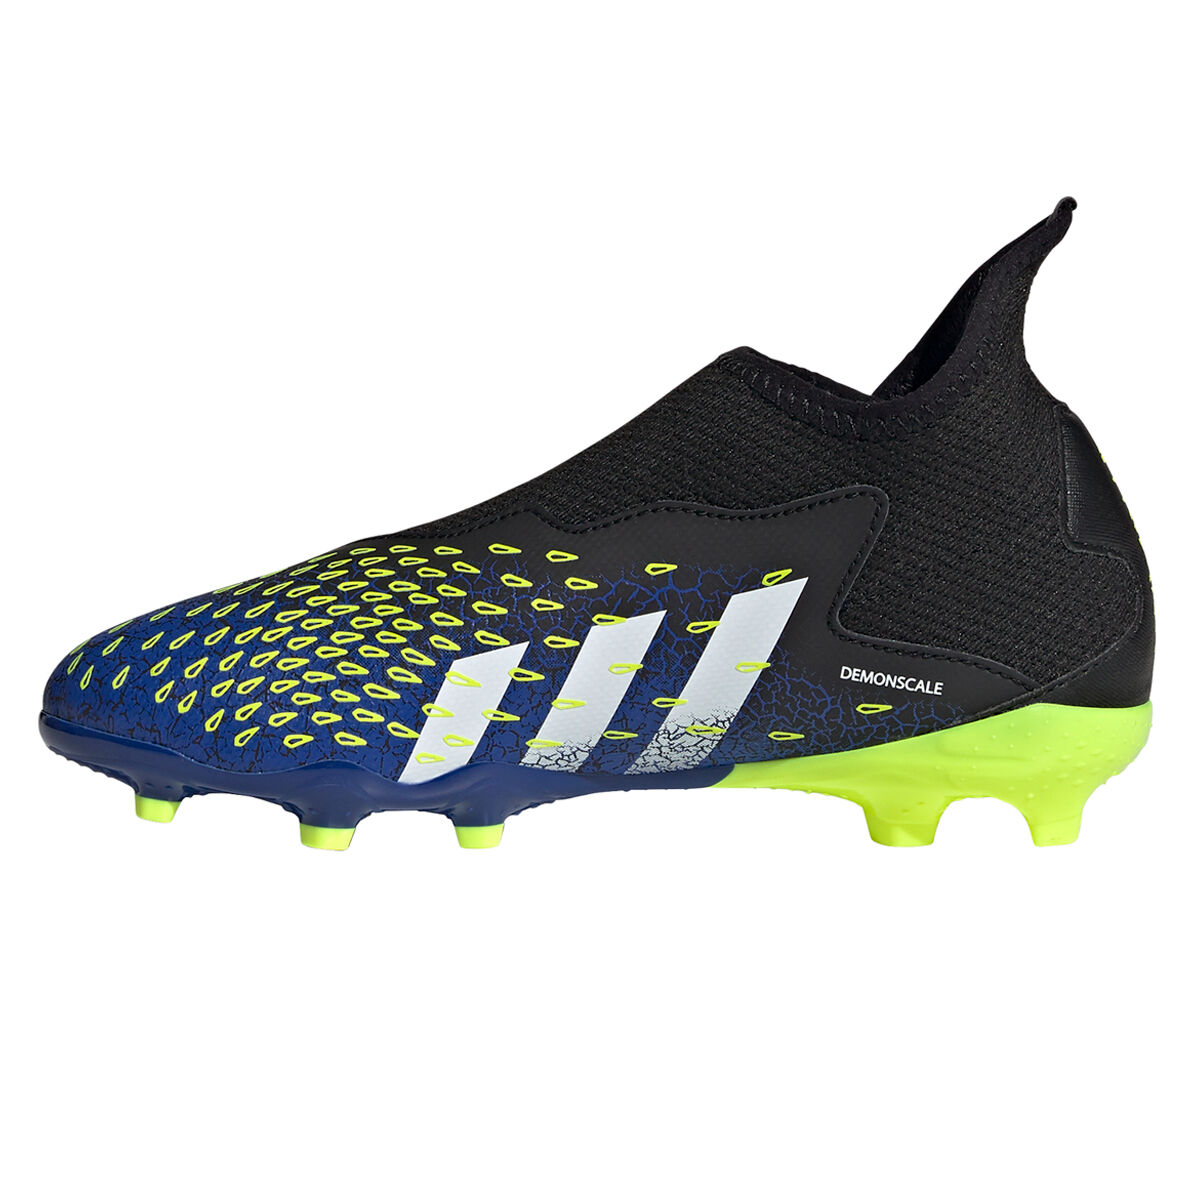 academy toddler adidas shoes for girls | adidas Predator Freak .3 Laceless Kids Football Boots